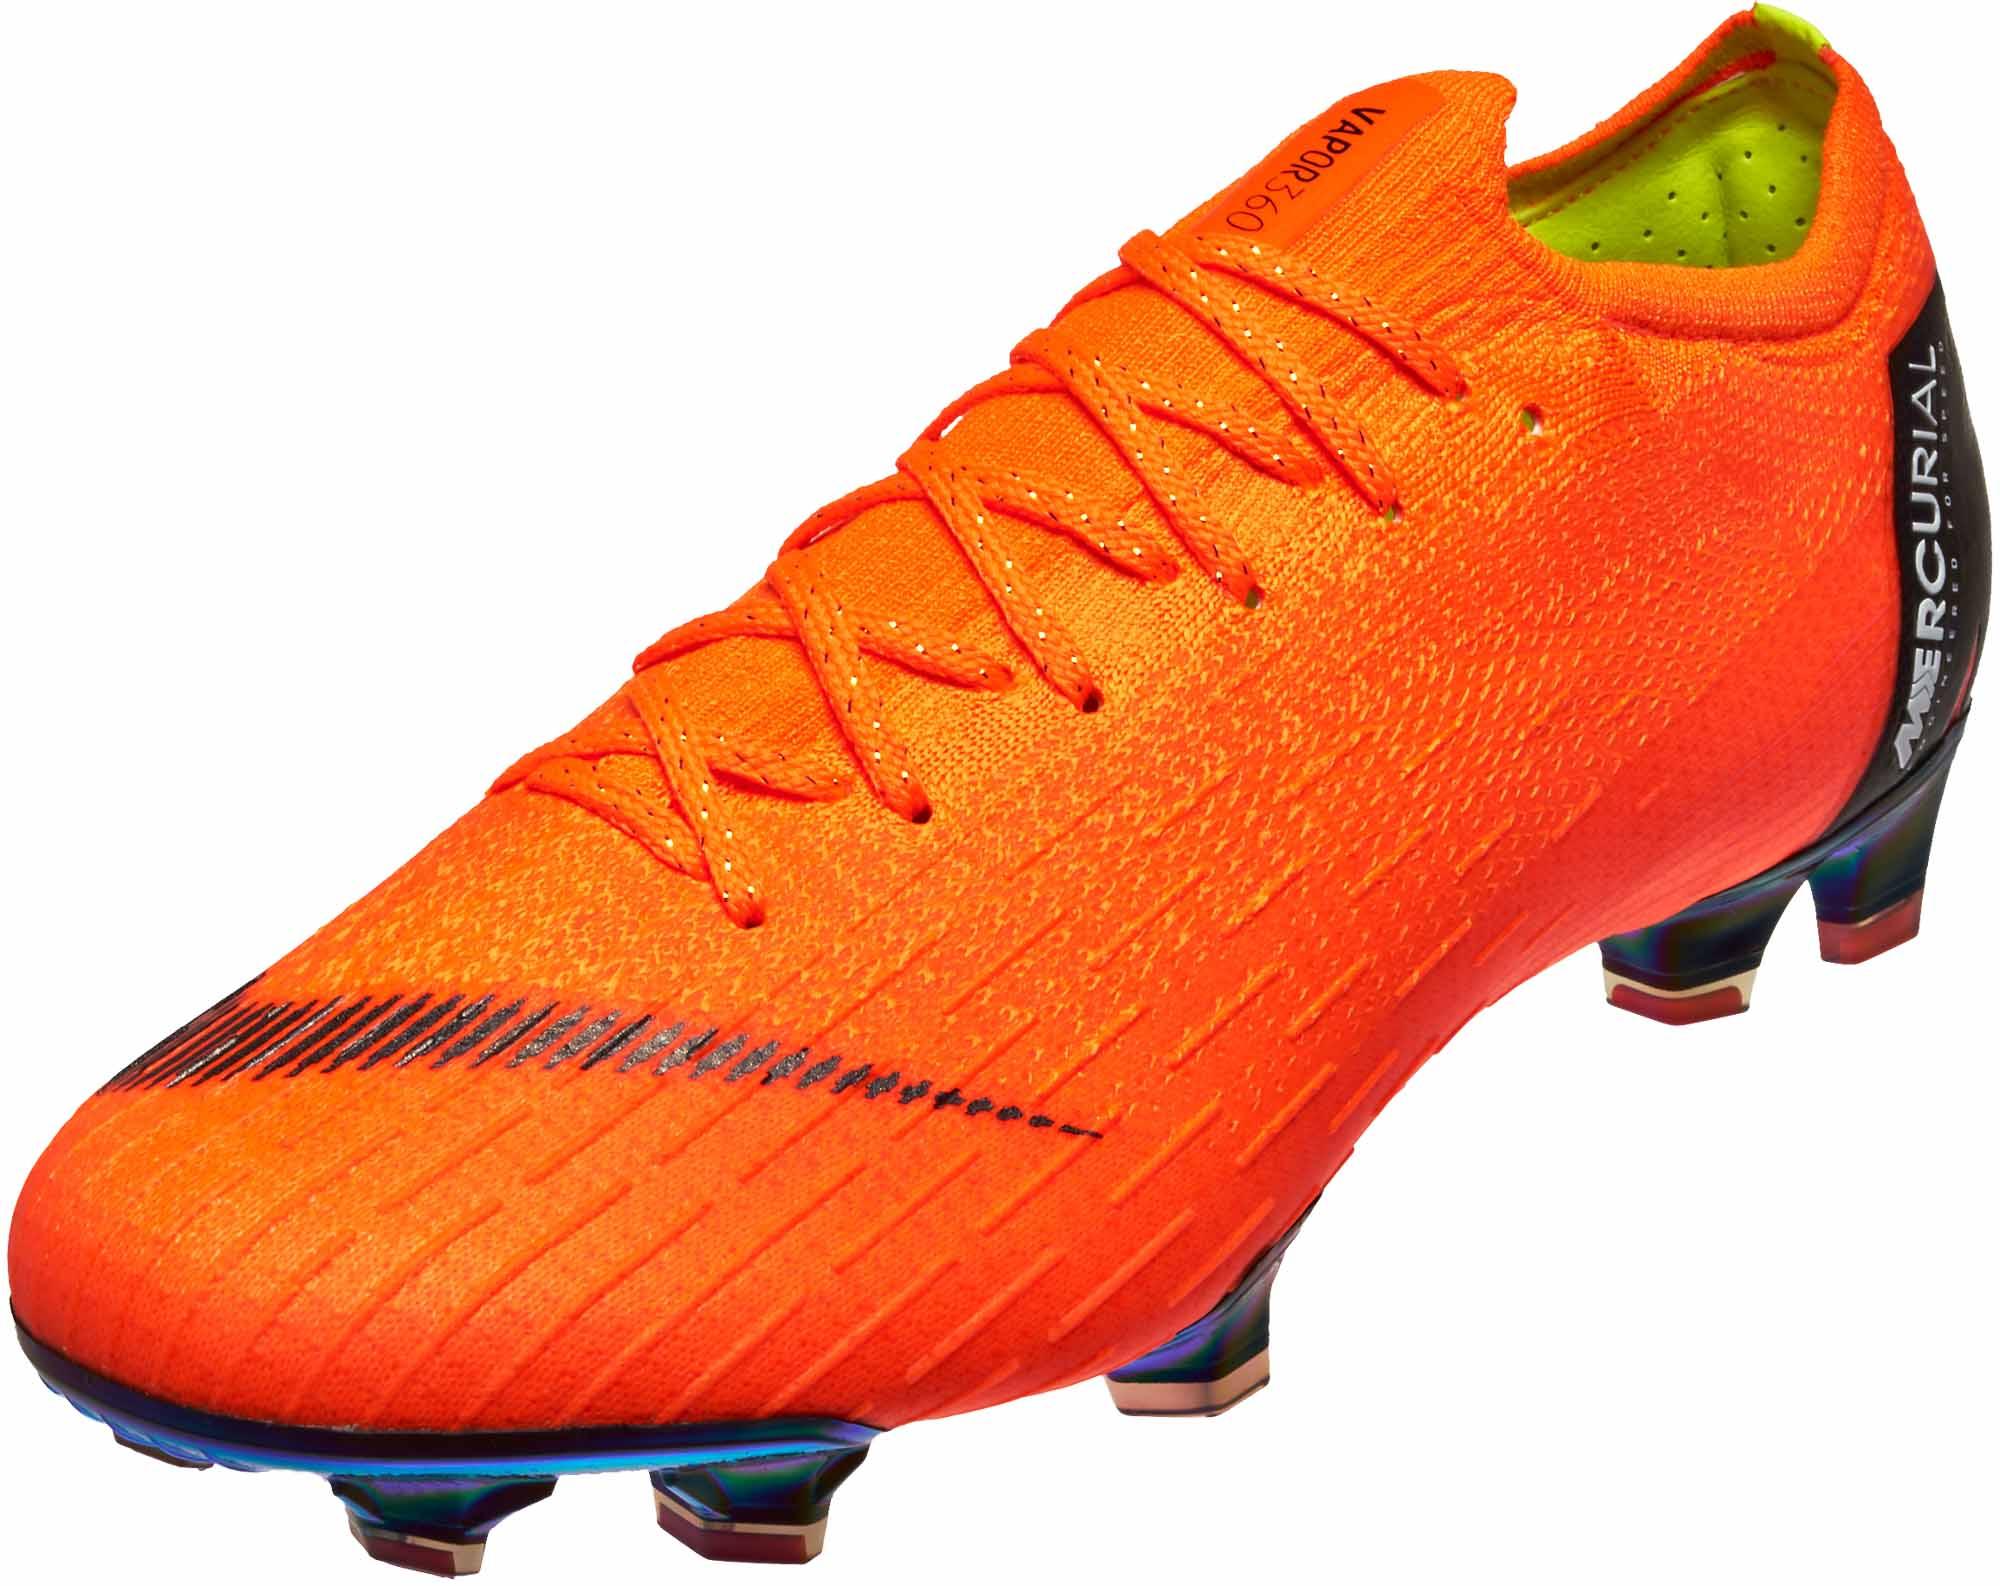 new styles 761e7 0a468 Nike Vapor 12 Elite FG – Total OrangeVolt